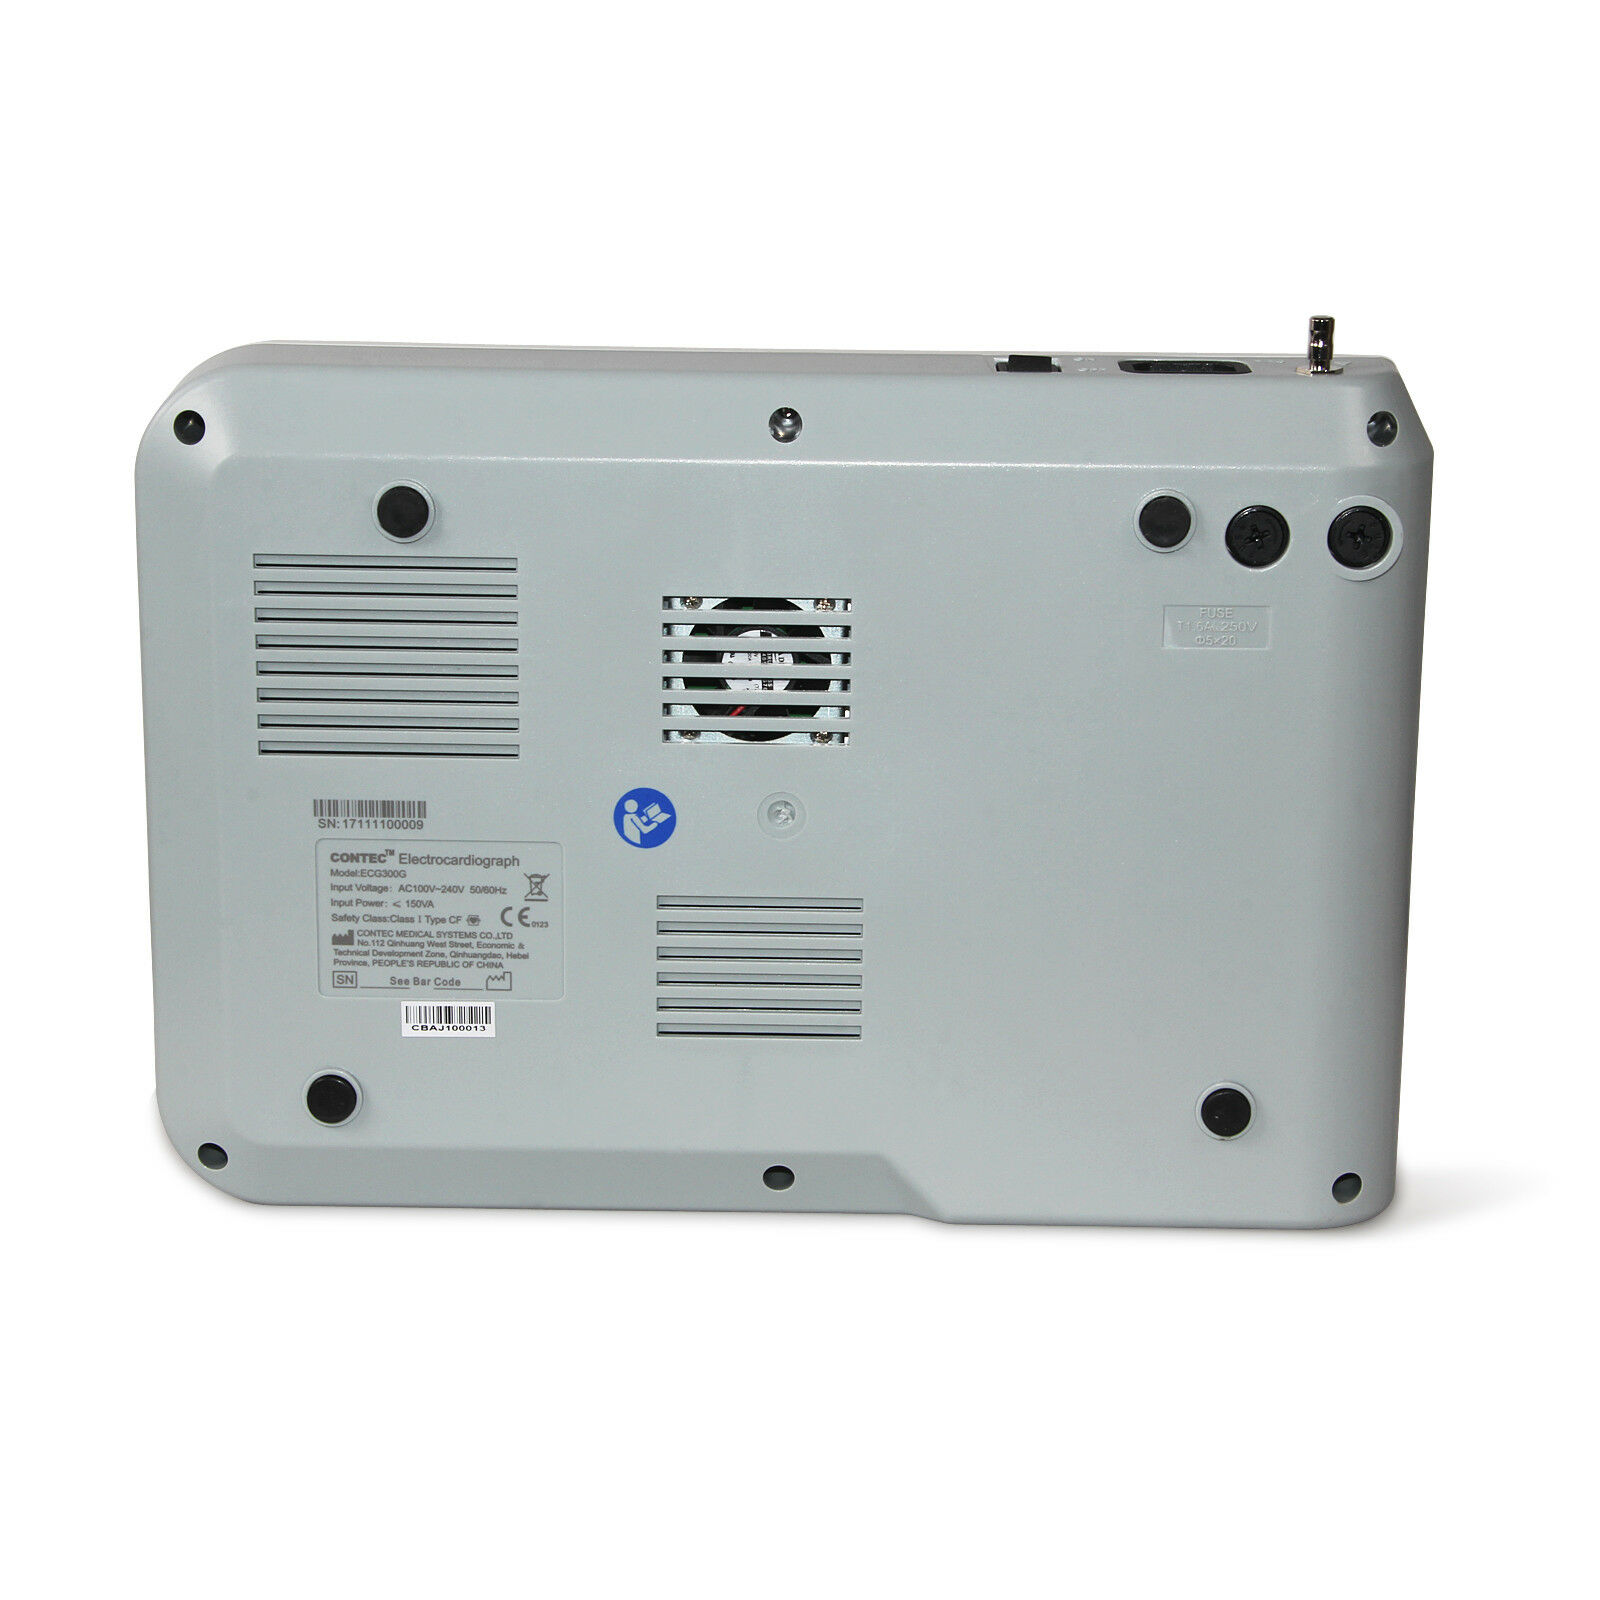 Digital 3 Channel 12 Lead Ecg Ekg Machine Software Electrocardiograph Us Seller